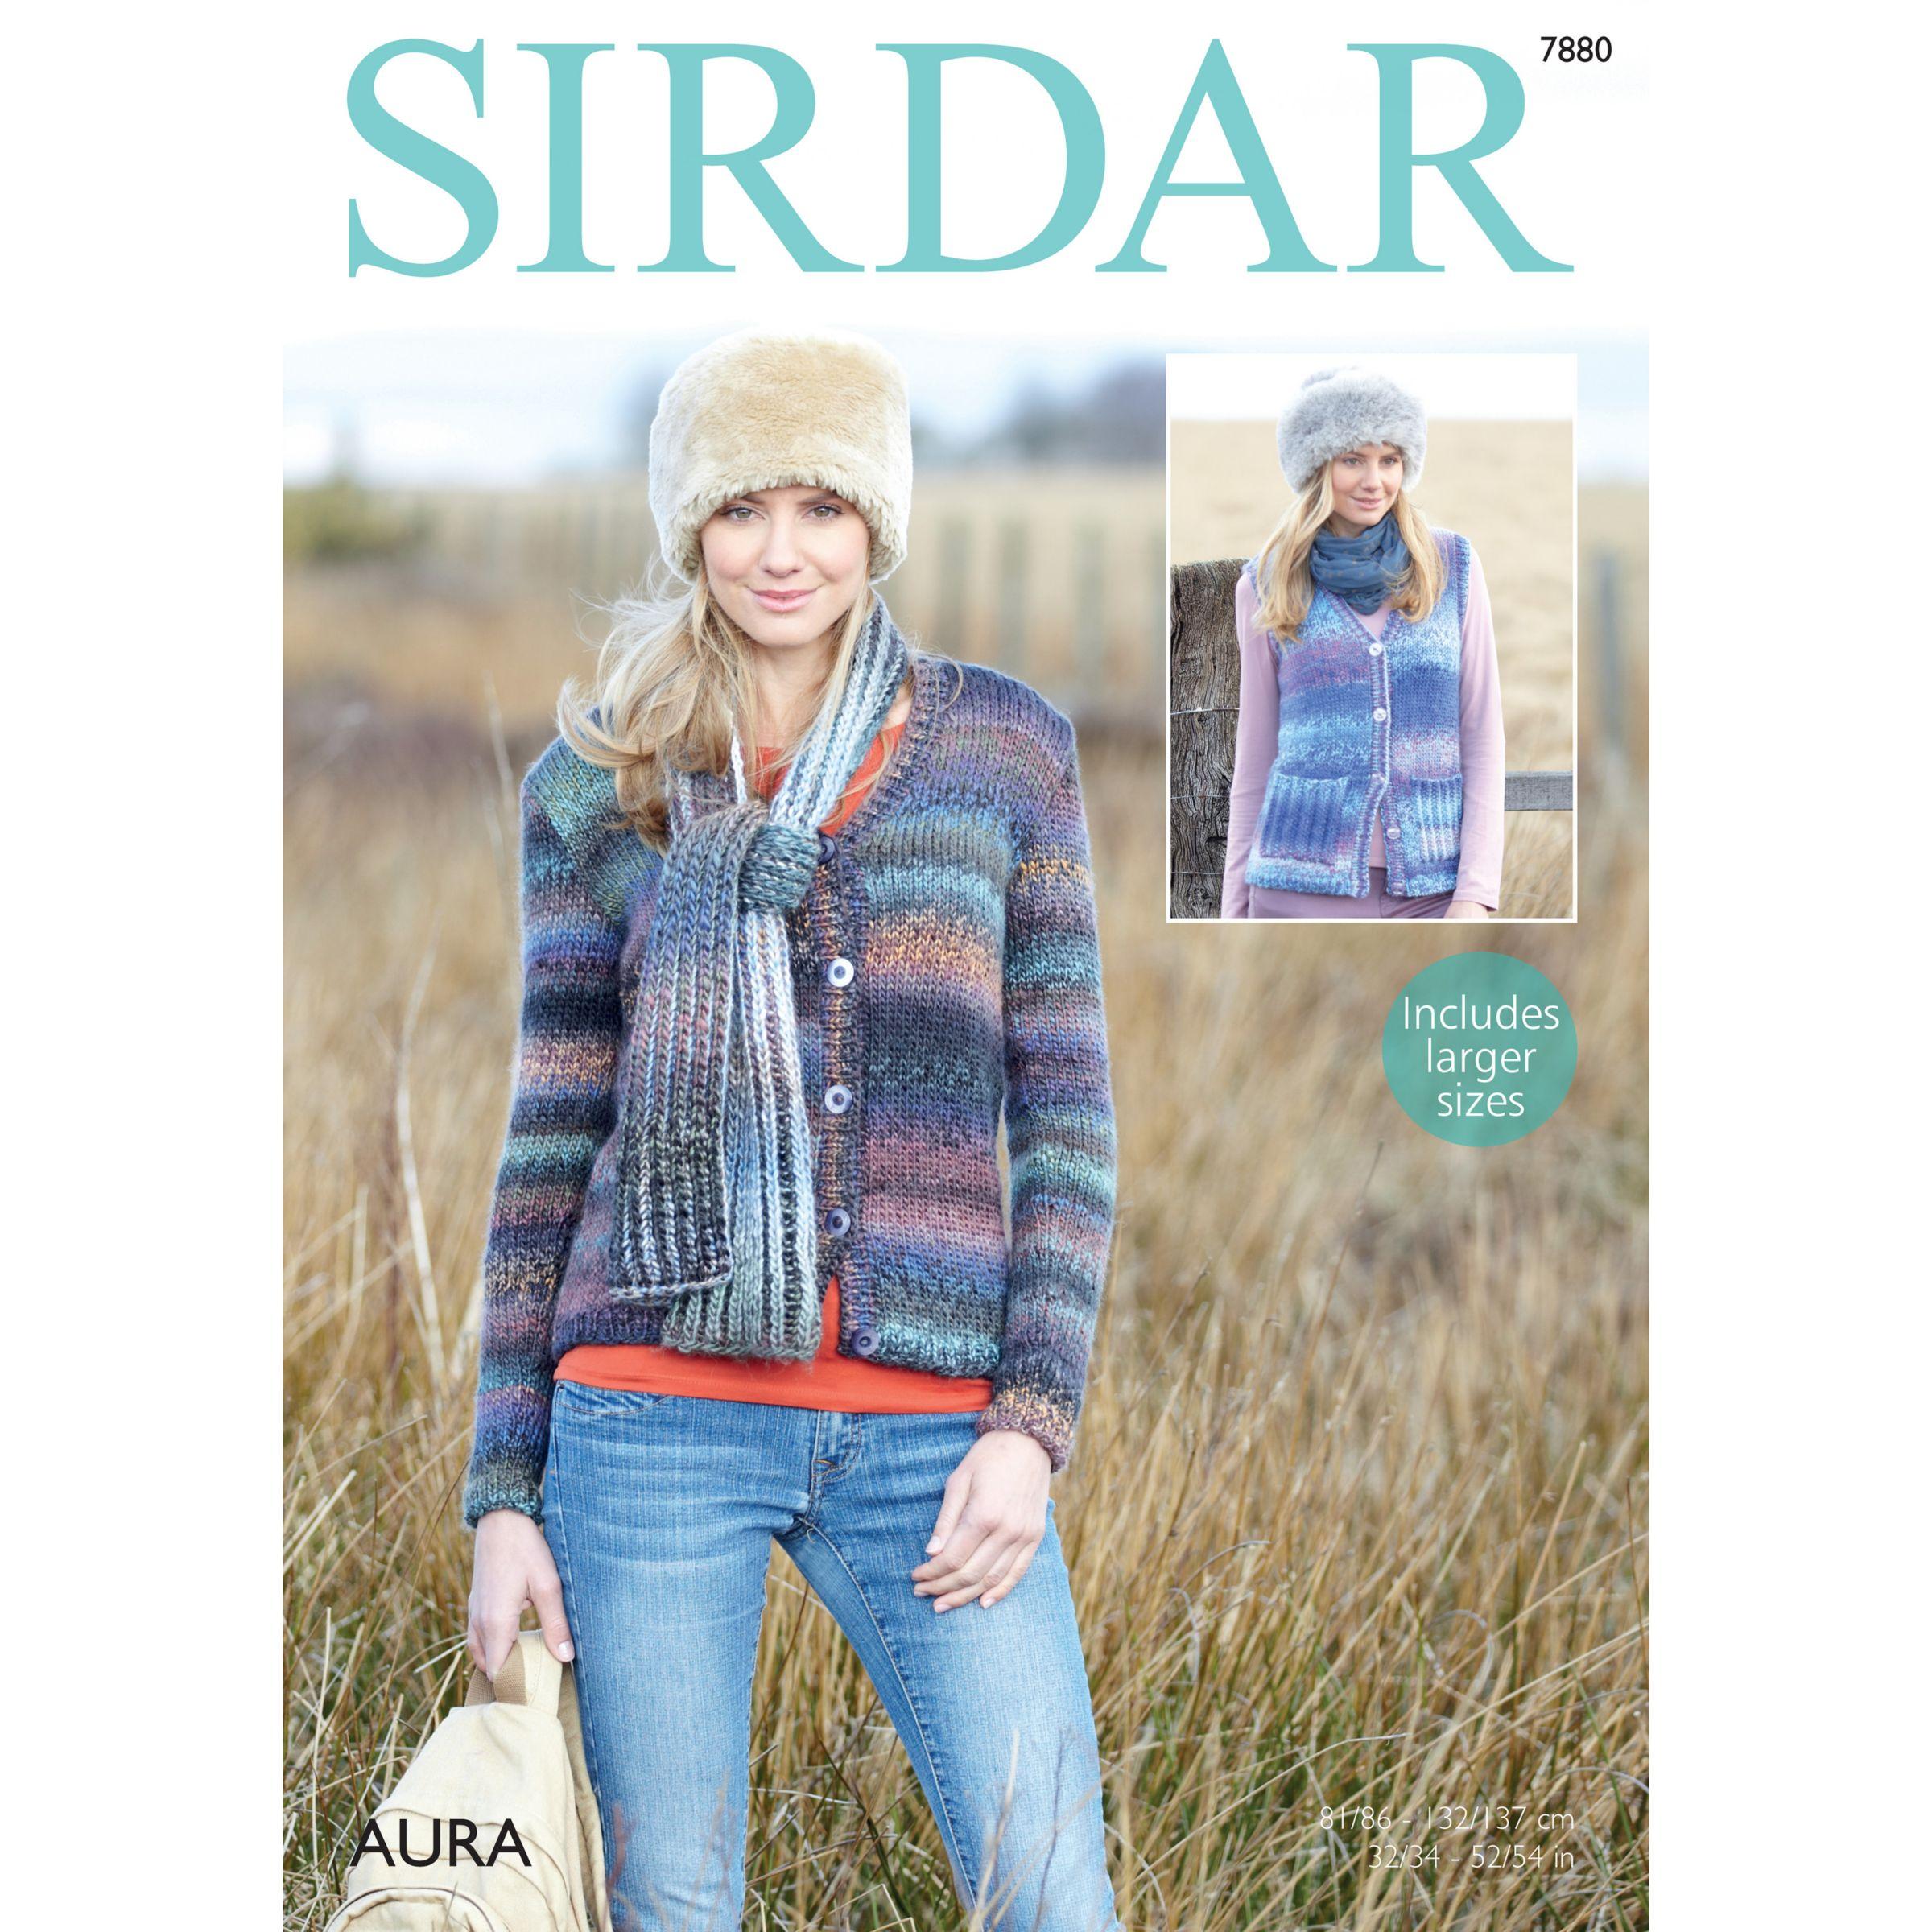 Sirdar Sirdar Aura Chunky Cardigan Knitting Pattern, 7880